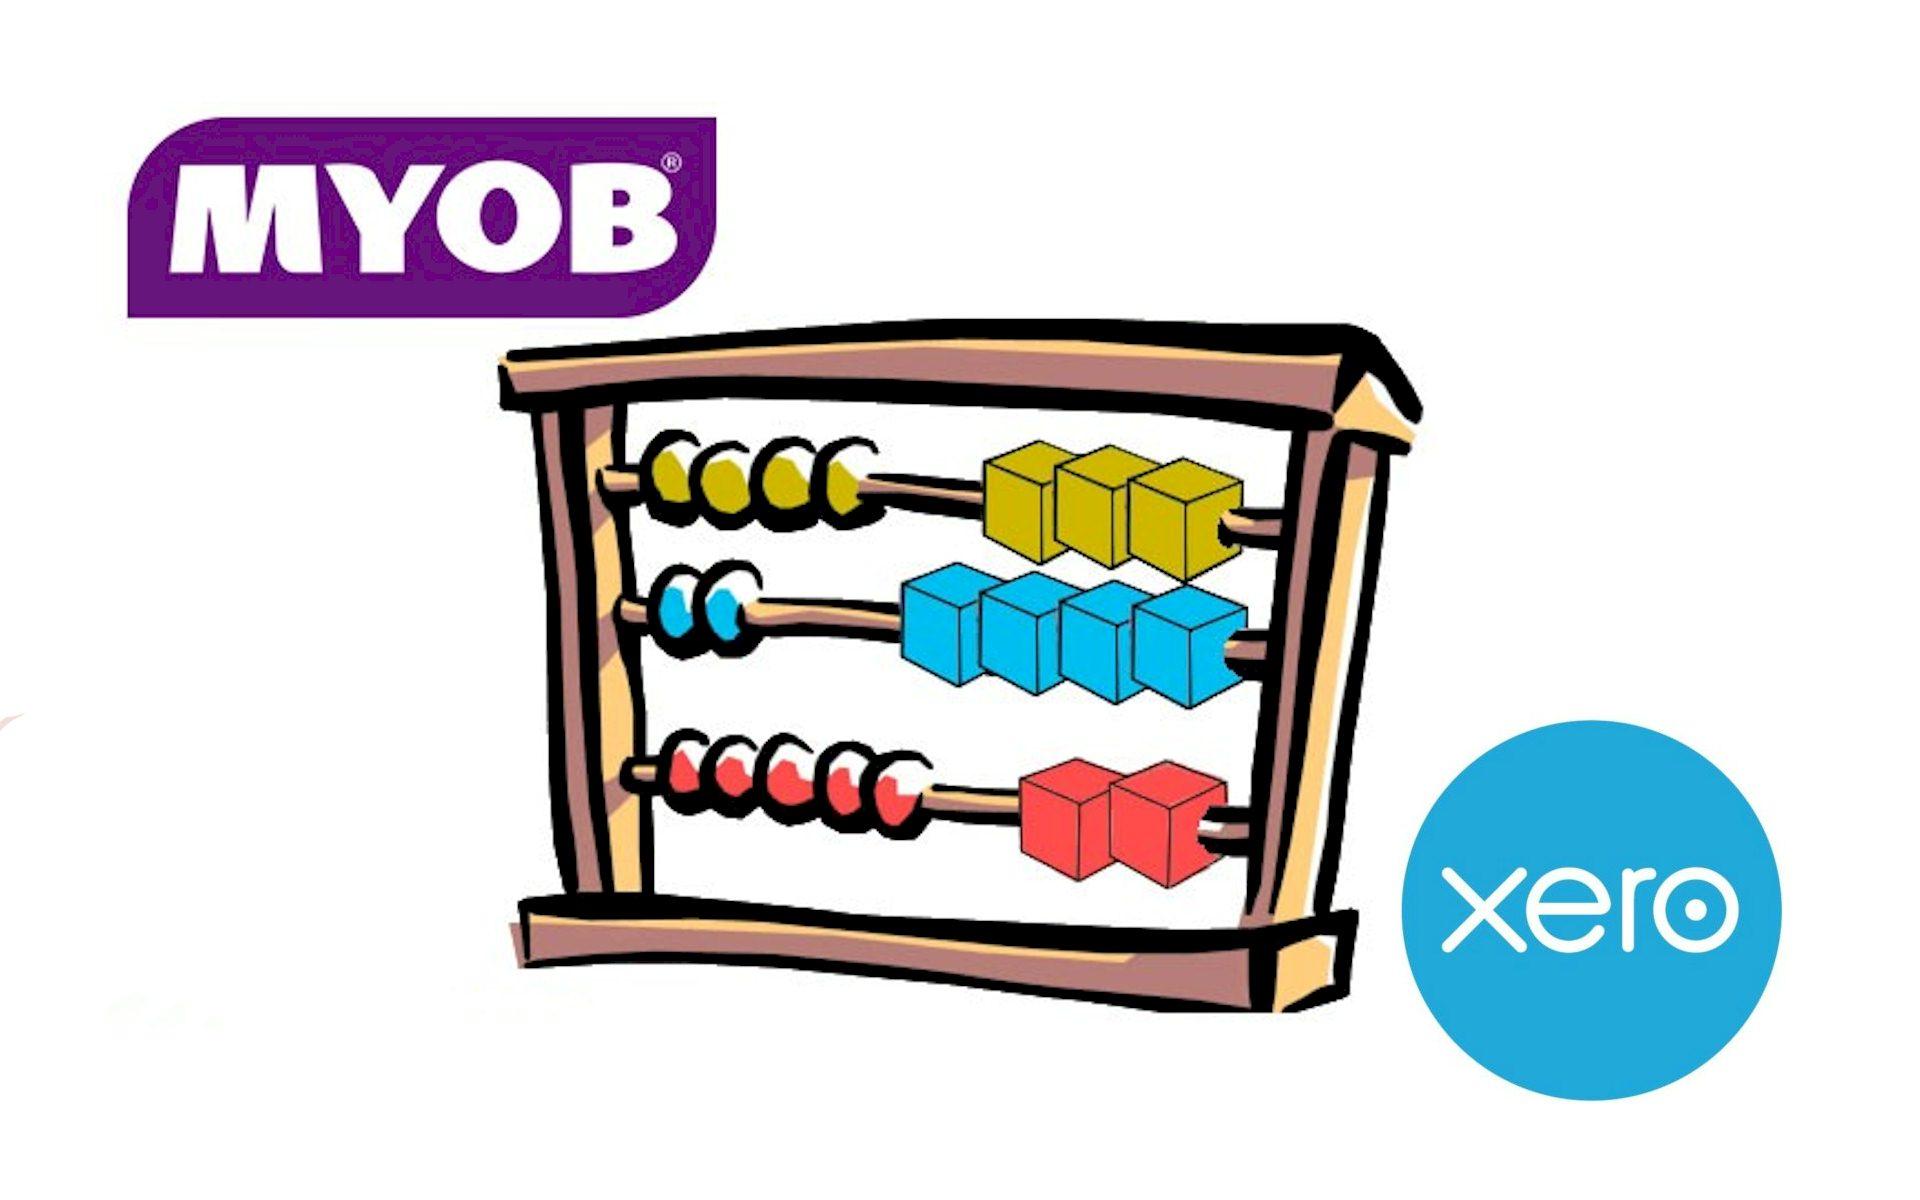 MYOB/Xero